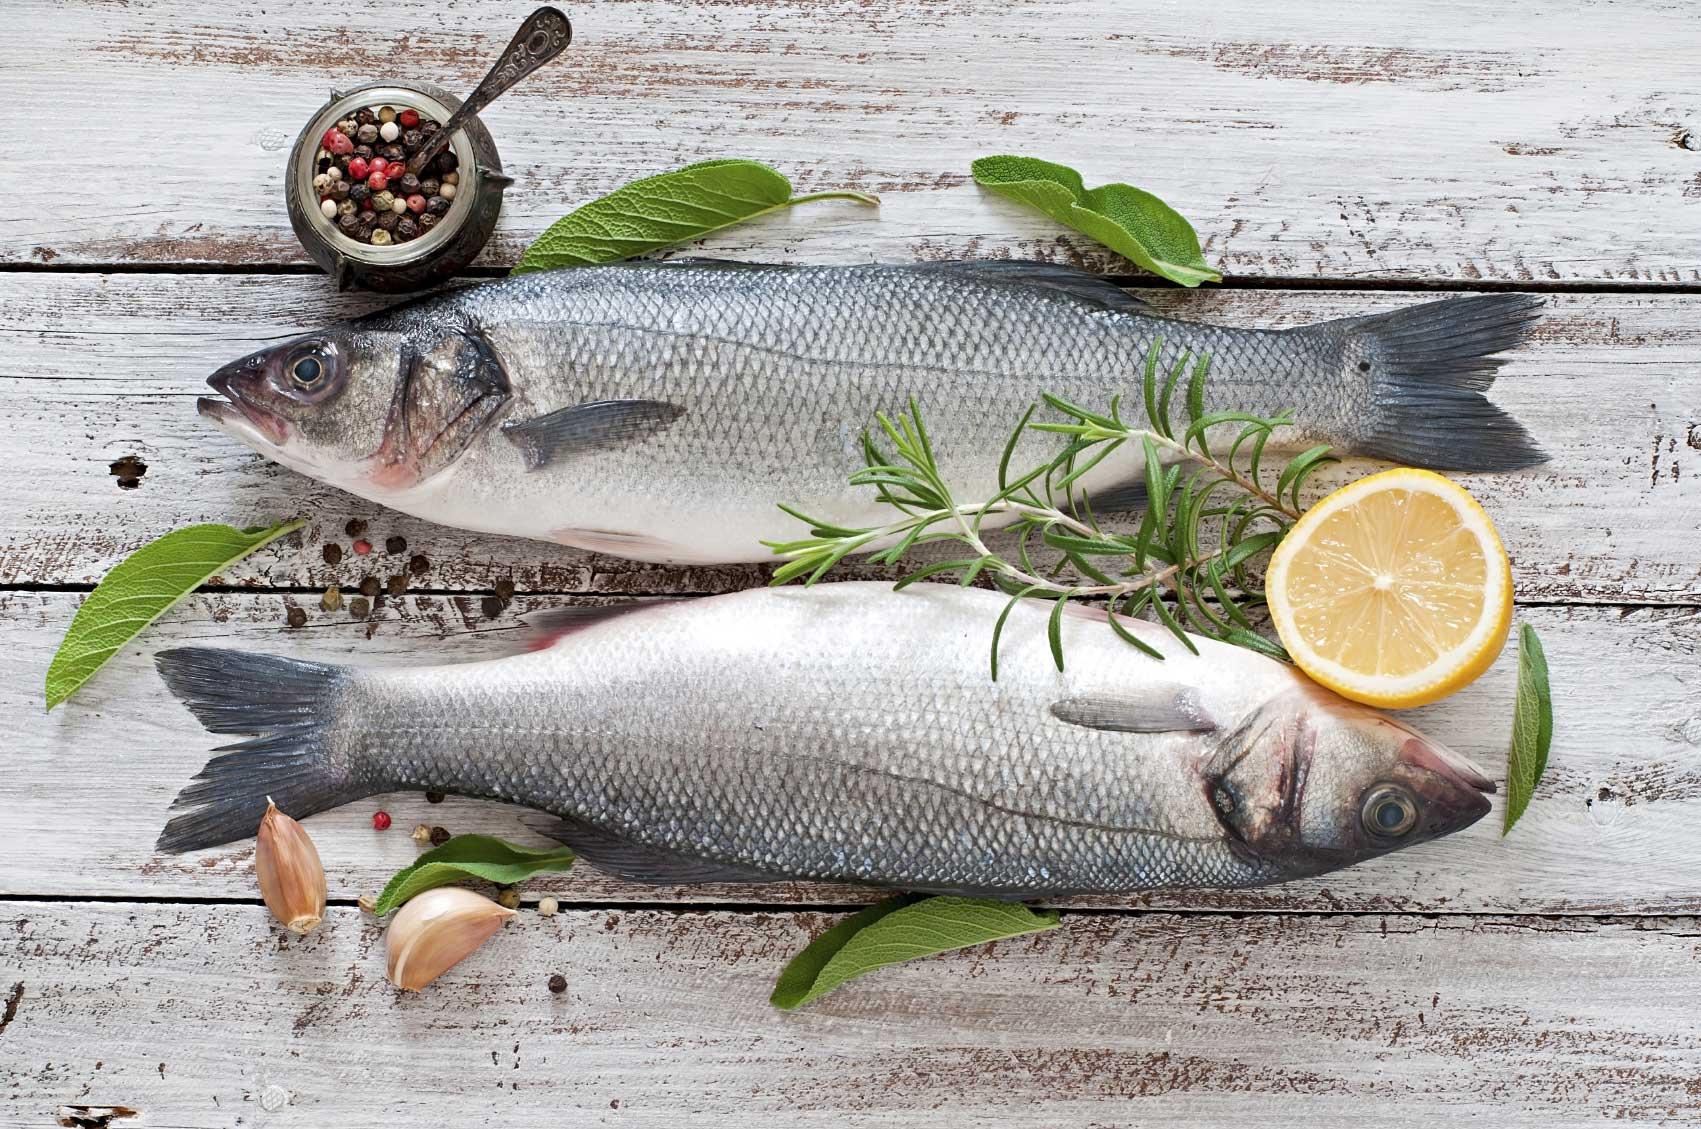 Seafood Supplier, Launceston, TAS